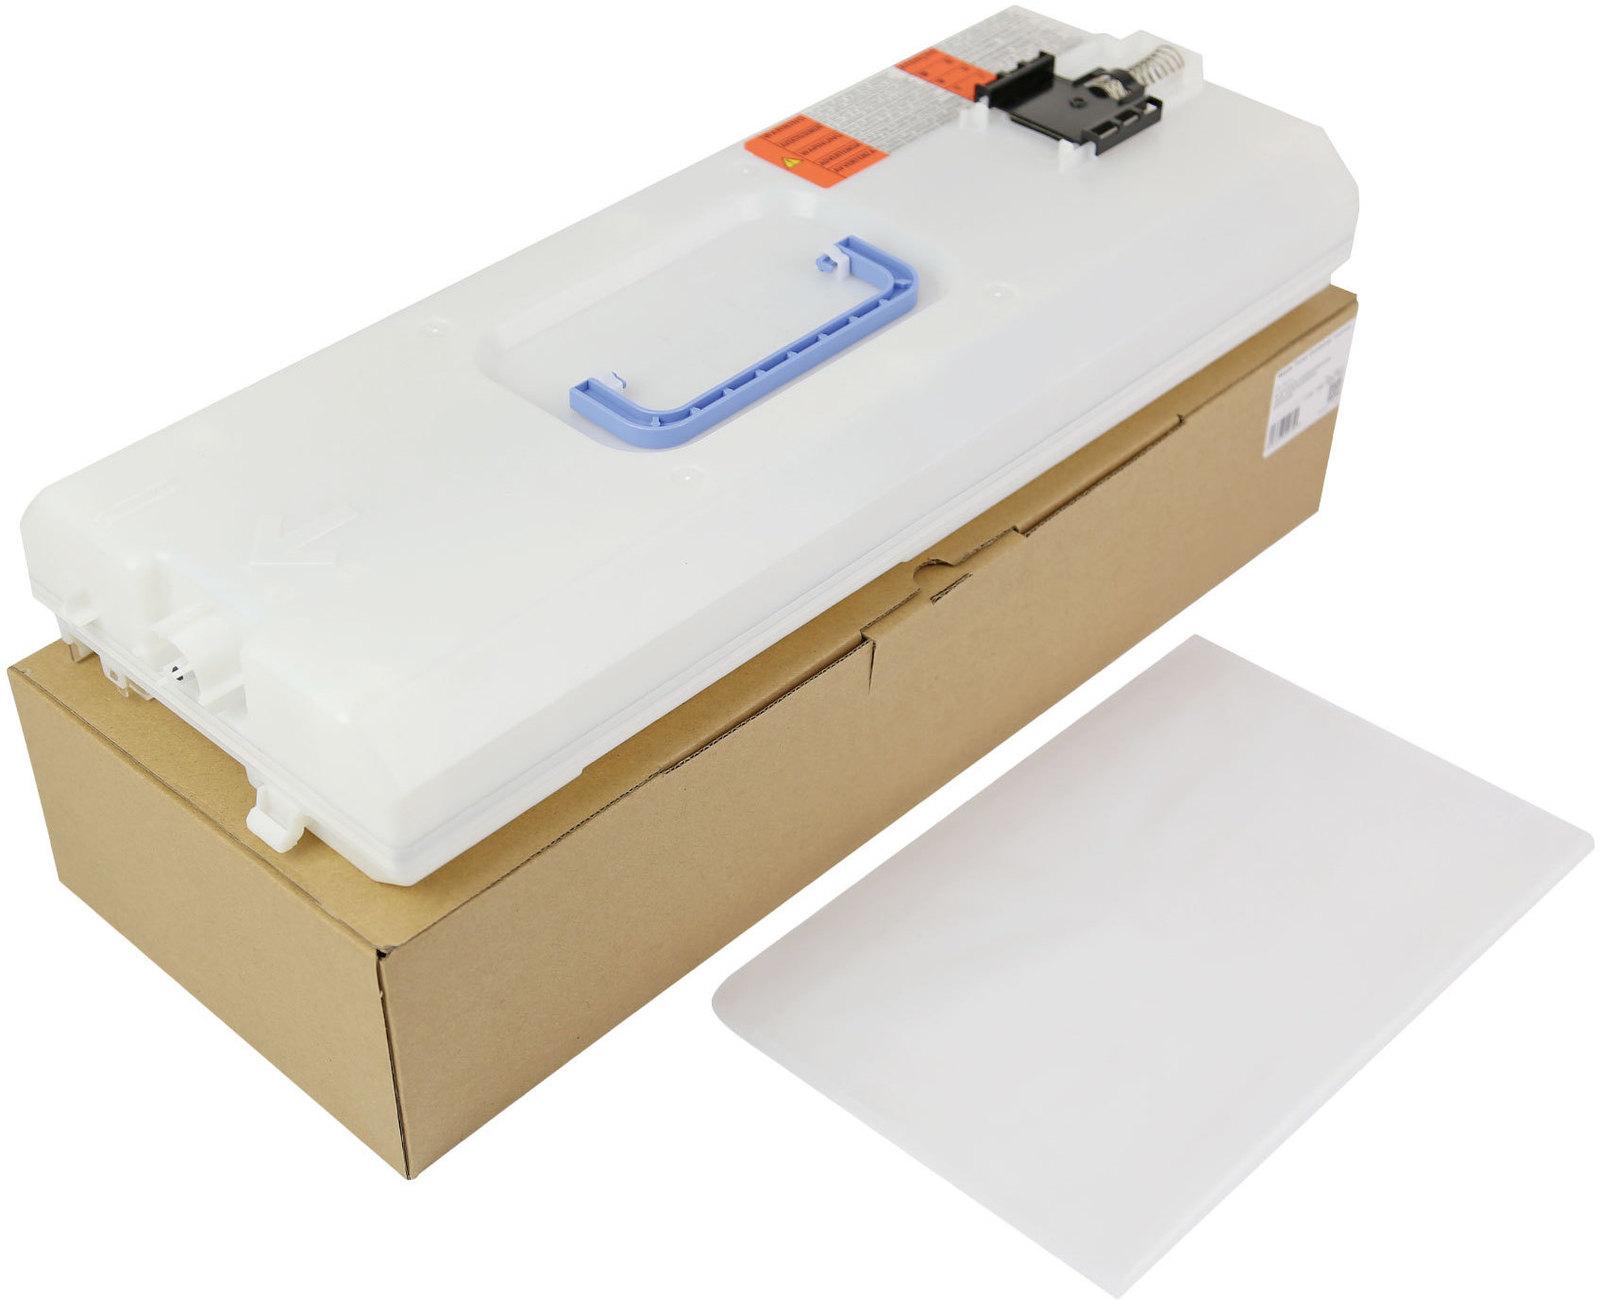 MicroSpareparts MSP5274 Laser/LED printer Waste toner container